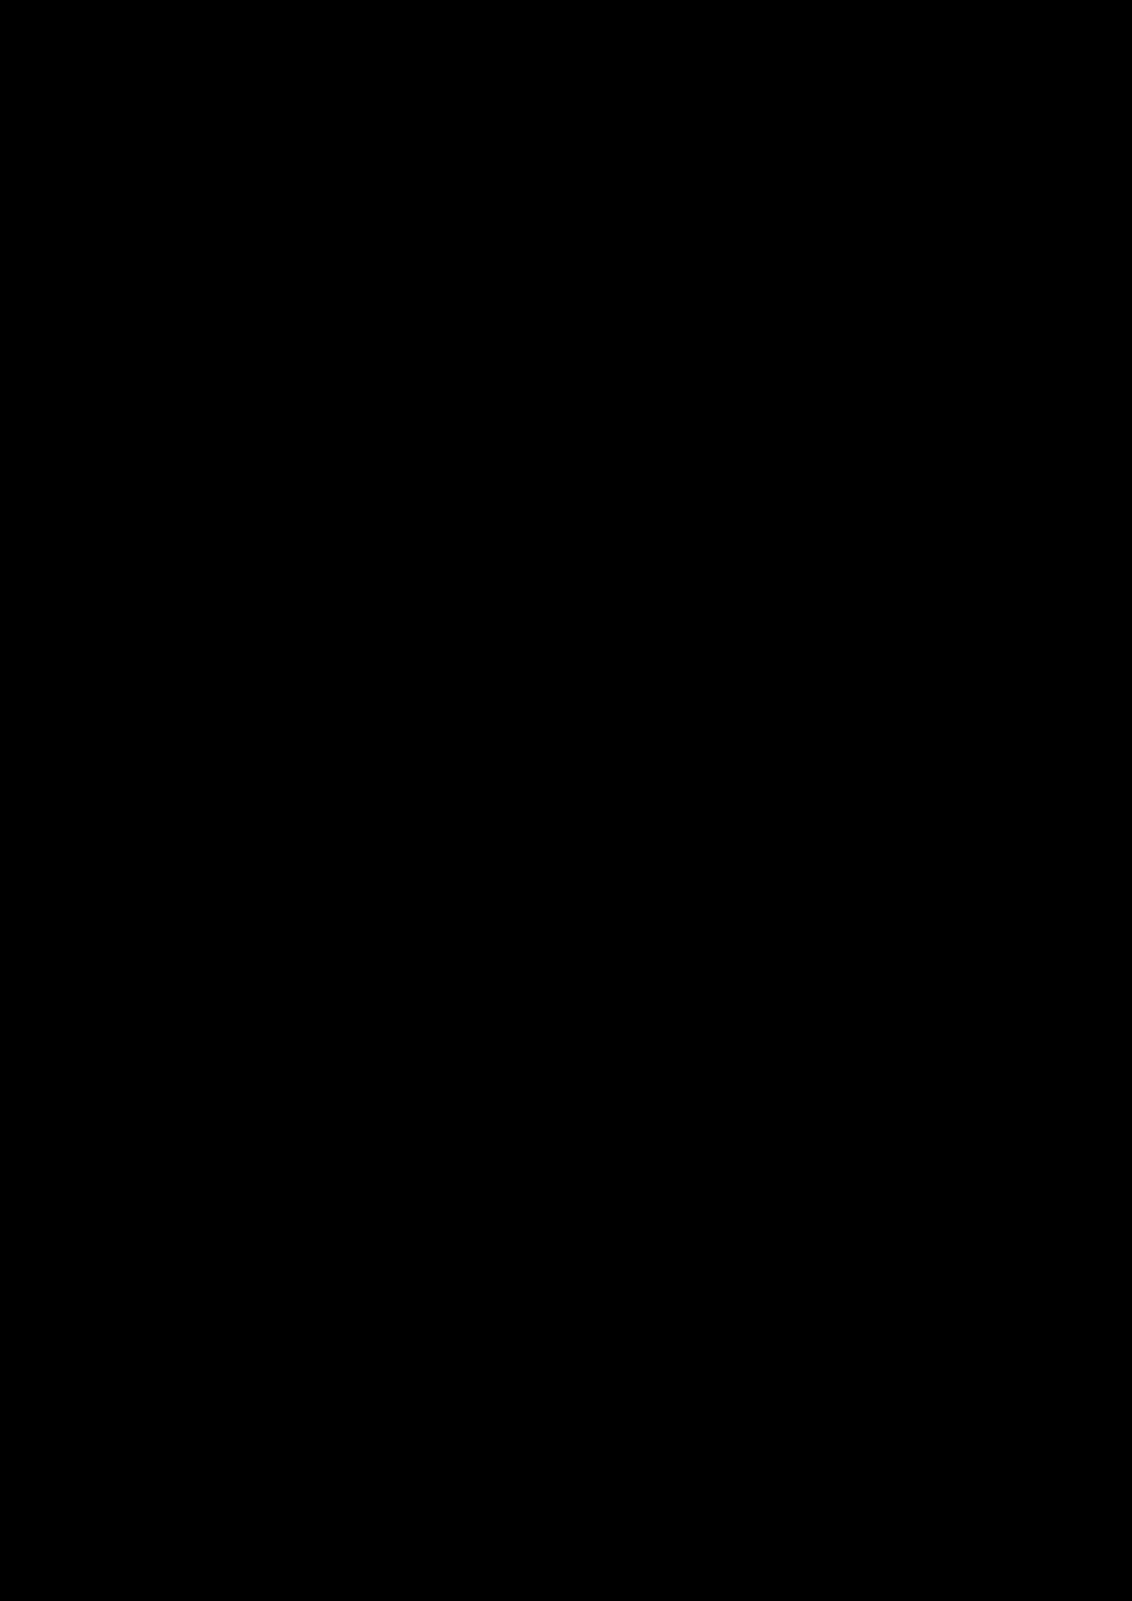 Belyiy sokol slide, Image 106